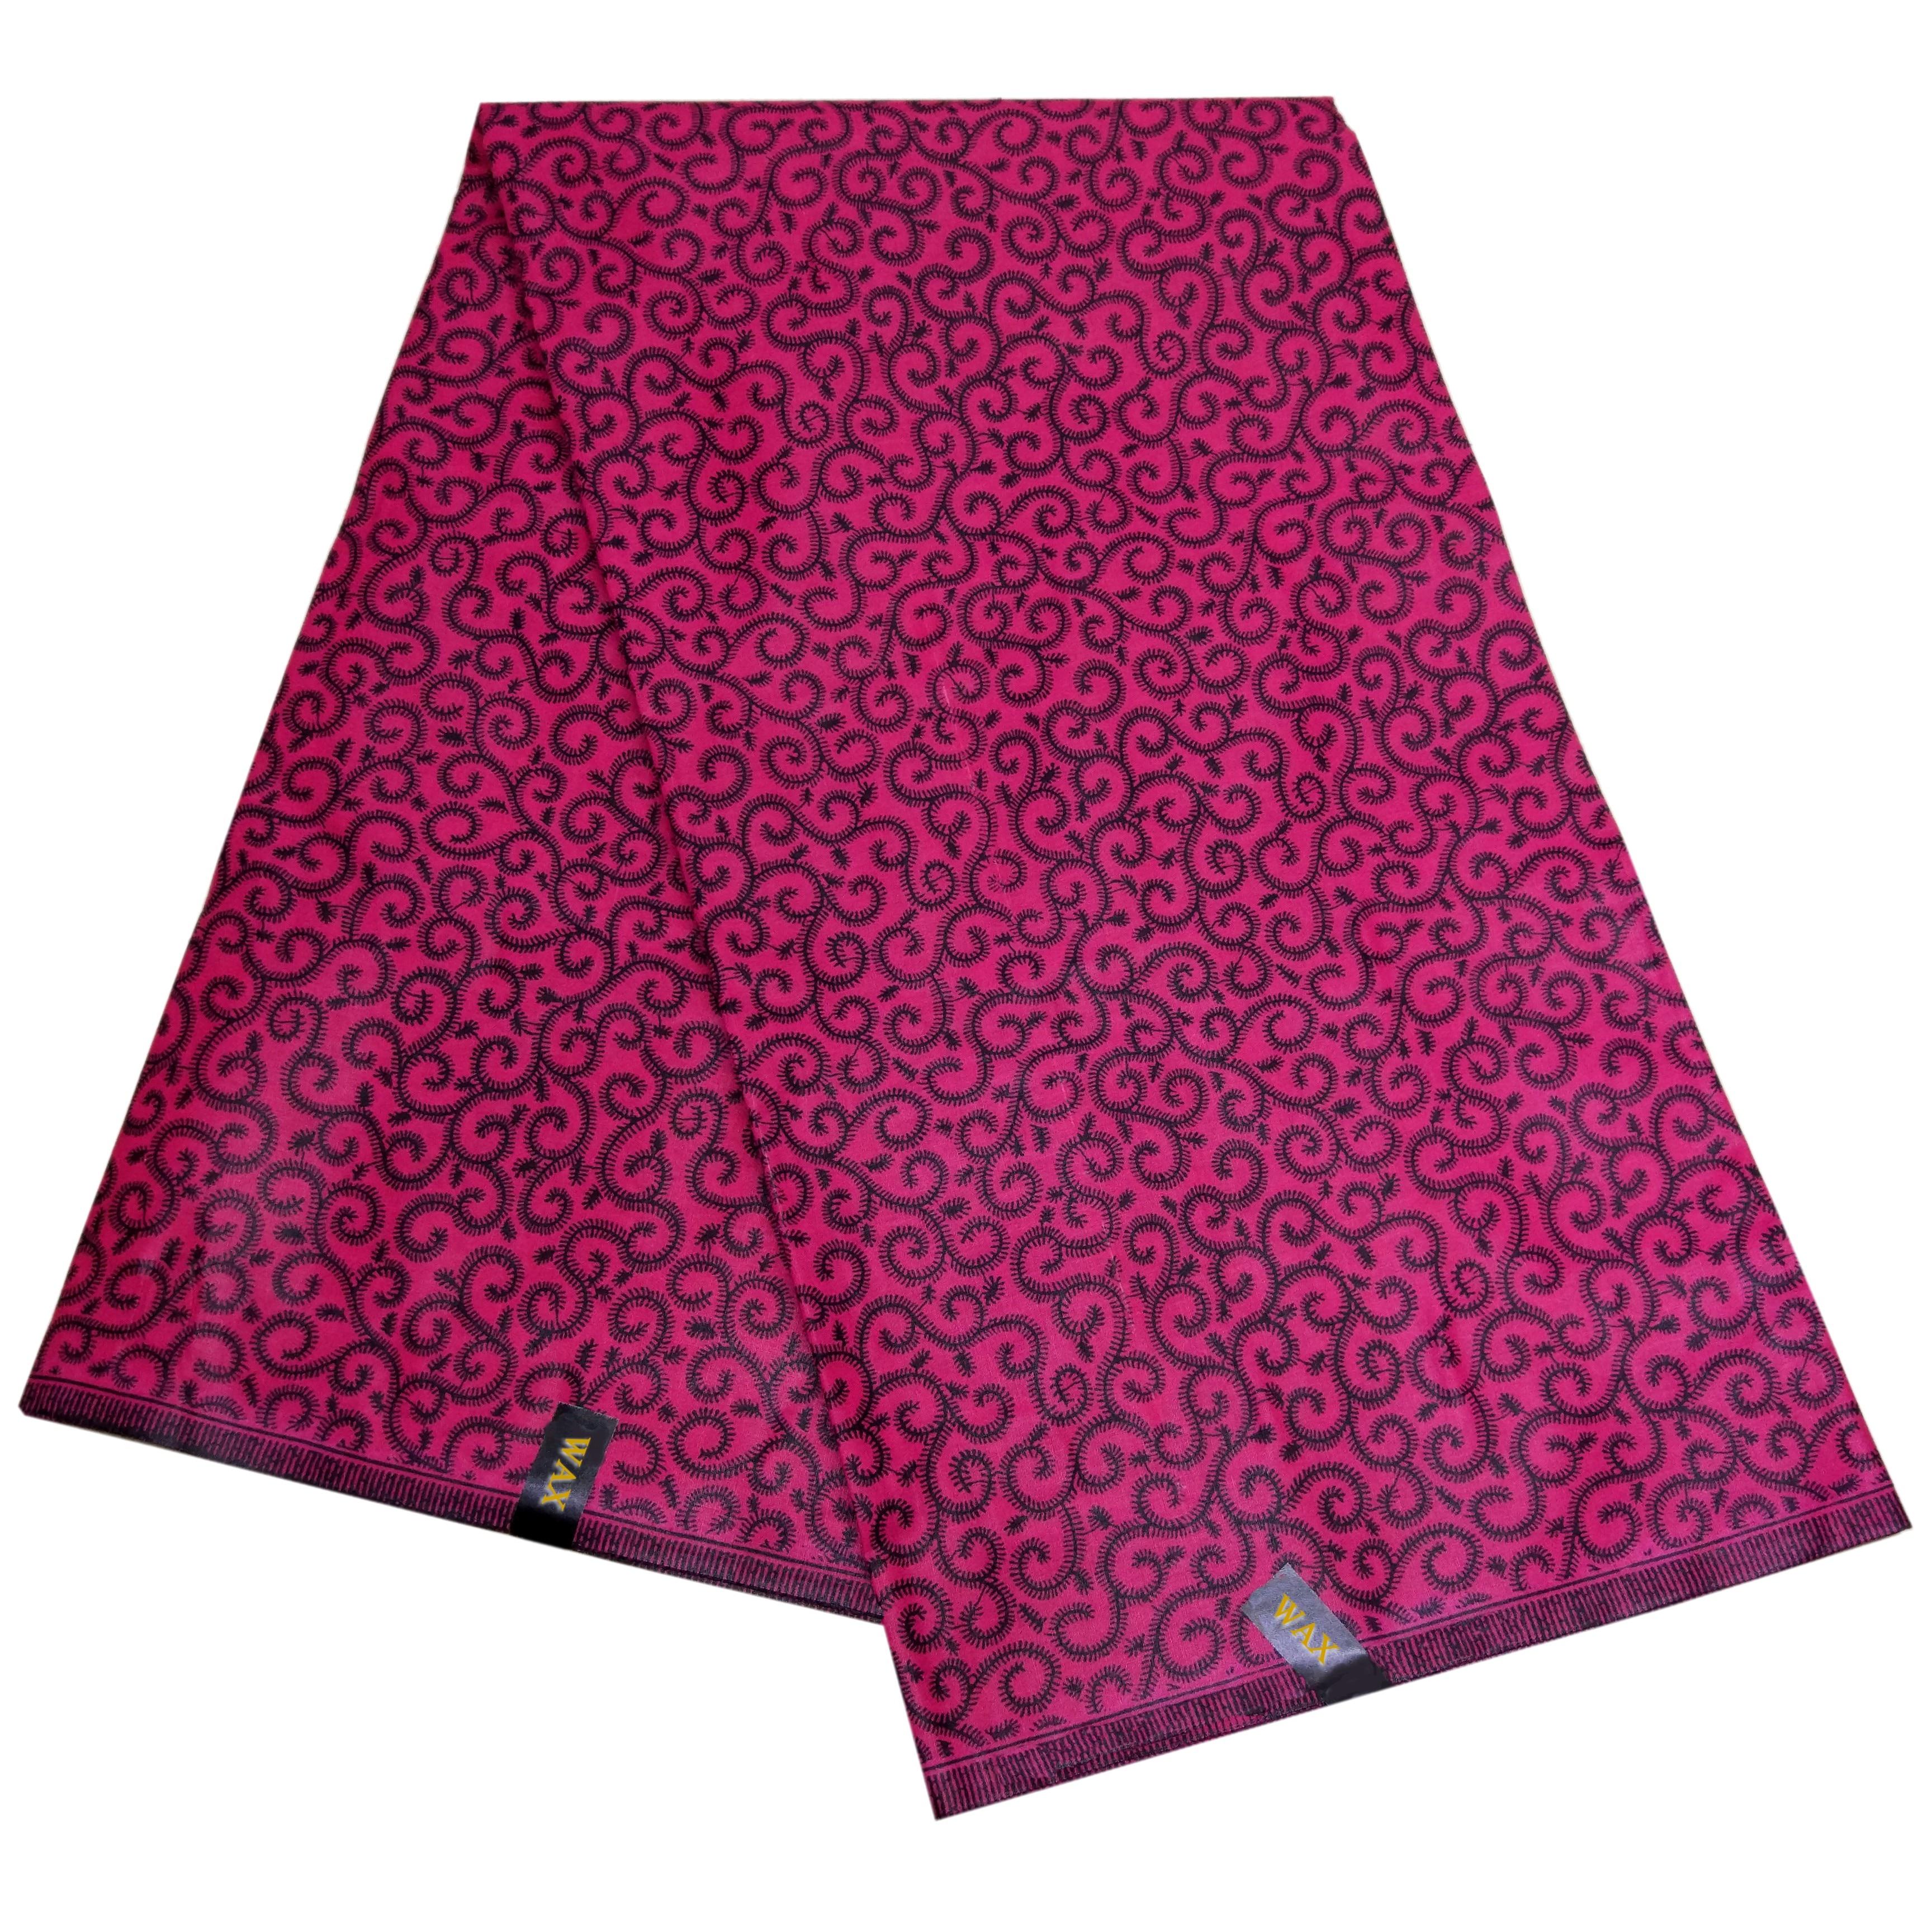 African Dashiki Nederlands Wax Fabric Floral Print Fuchsia Wax Fabric